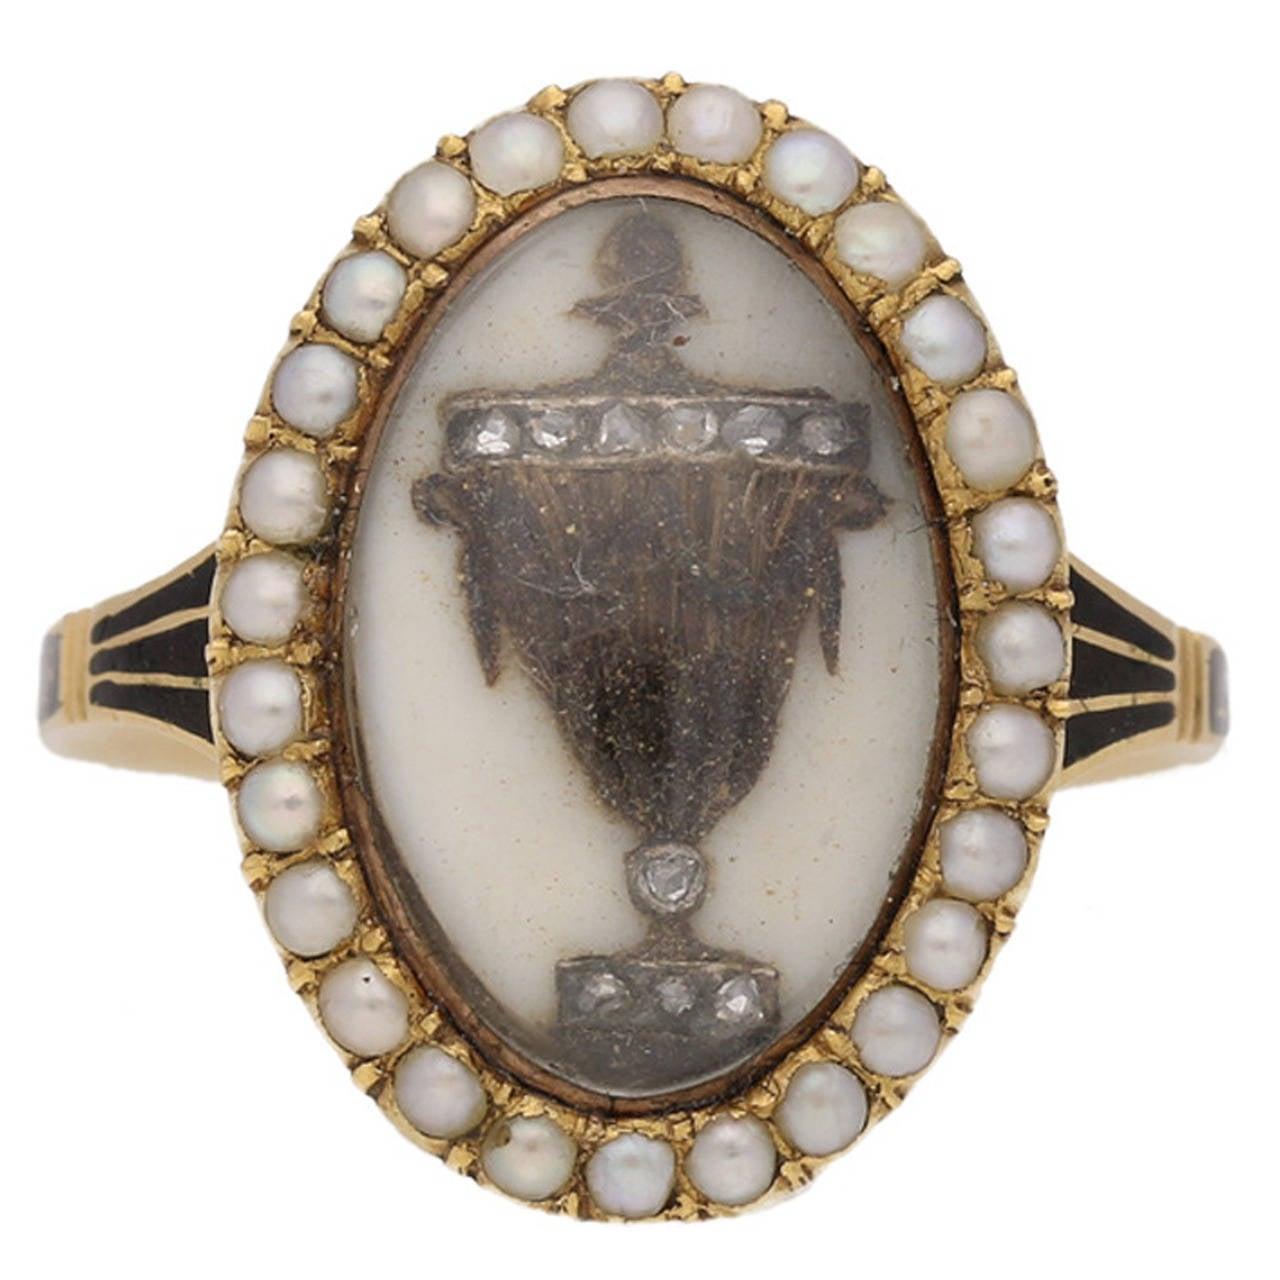 Antique Enamel Pearl Diamond Gold Memorial Ring For Sale. Animal Rings. Burnt Wedding Rings. Right Wedding Rings. 2.15 Carat Wedding Rings. Jhumki Rings. Crossover Band Engagement Rings. Pom Pom Rings. Deer Pearl Flower Wedding Rings